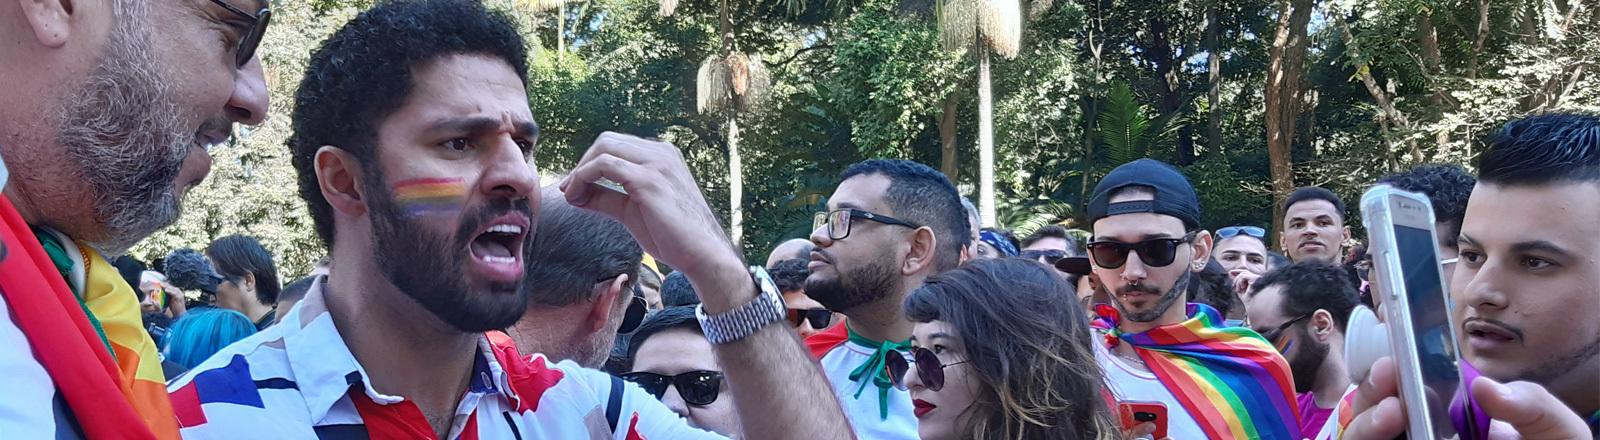 David Miranda auf der Pride Parade in Brasilien.